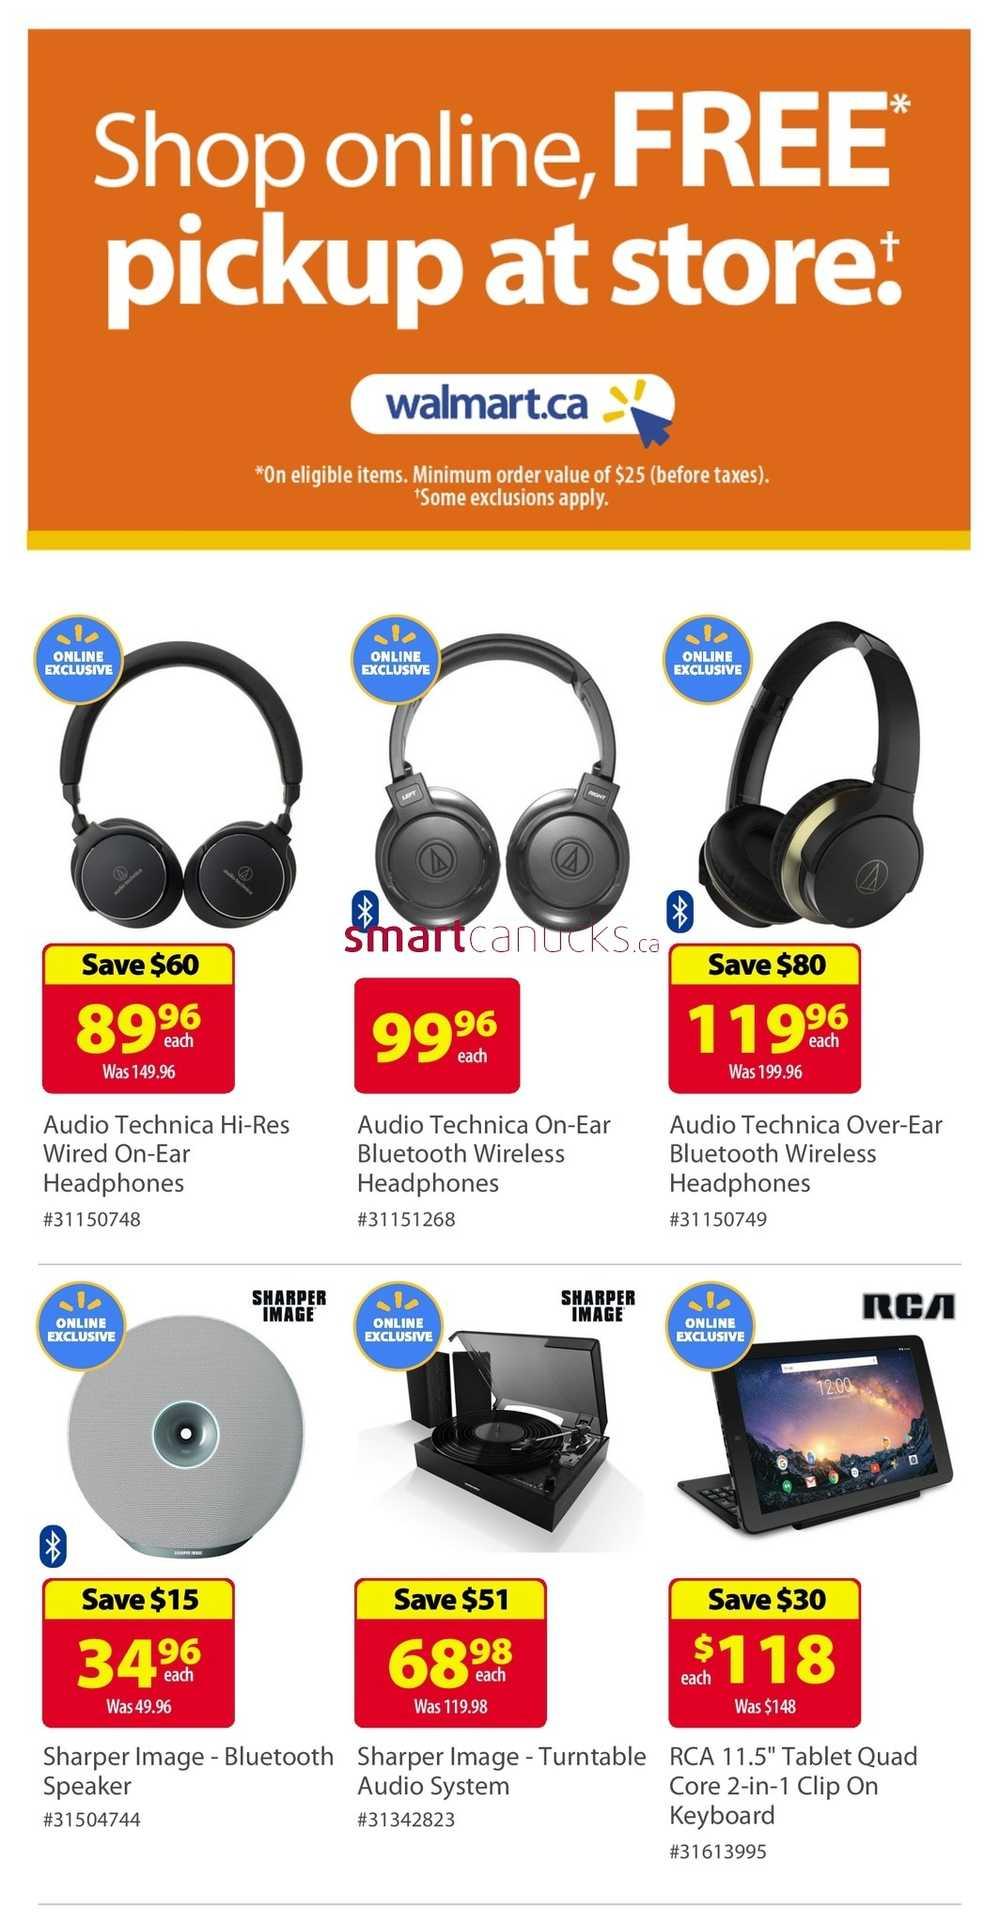 Walmart Cyber Monday Flyer November 26 To 29 2018 Walmart Canada Flyers Coupons Sales